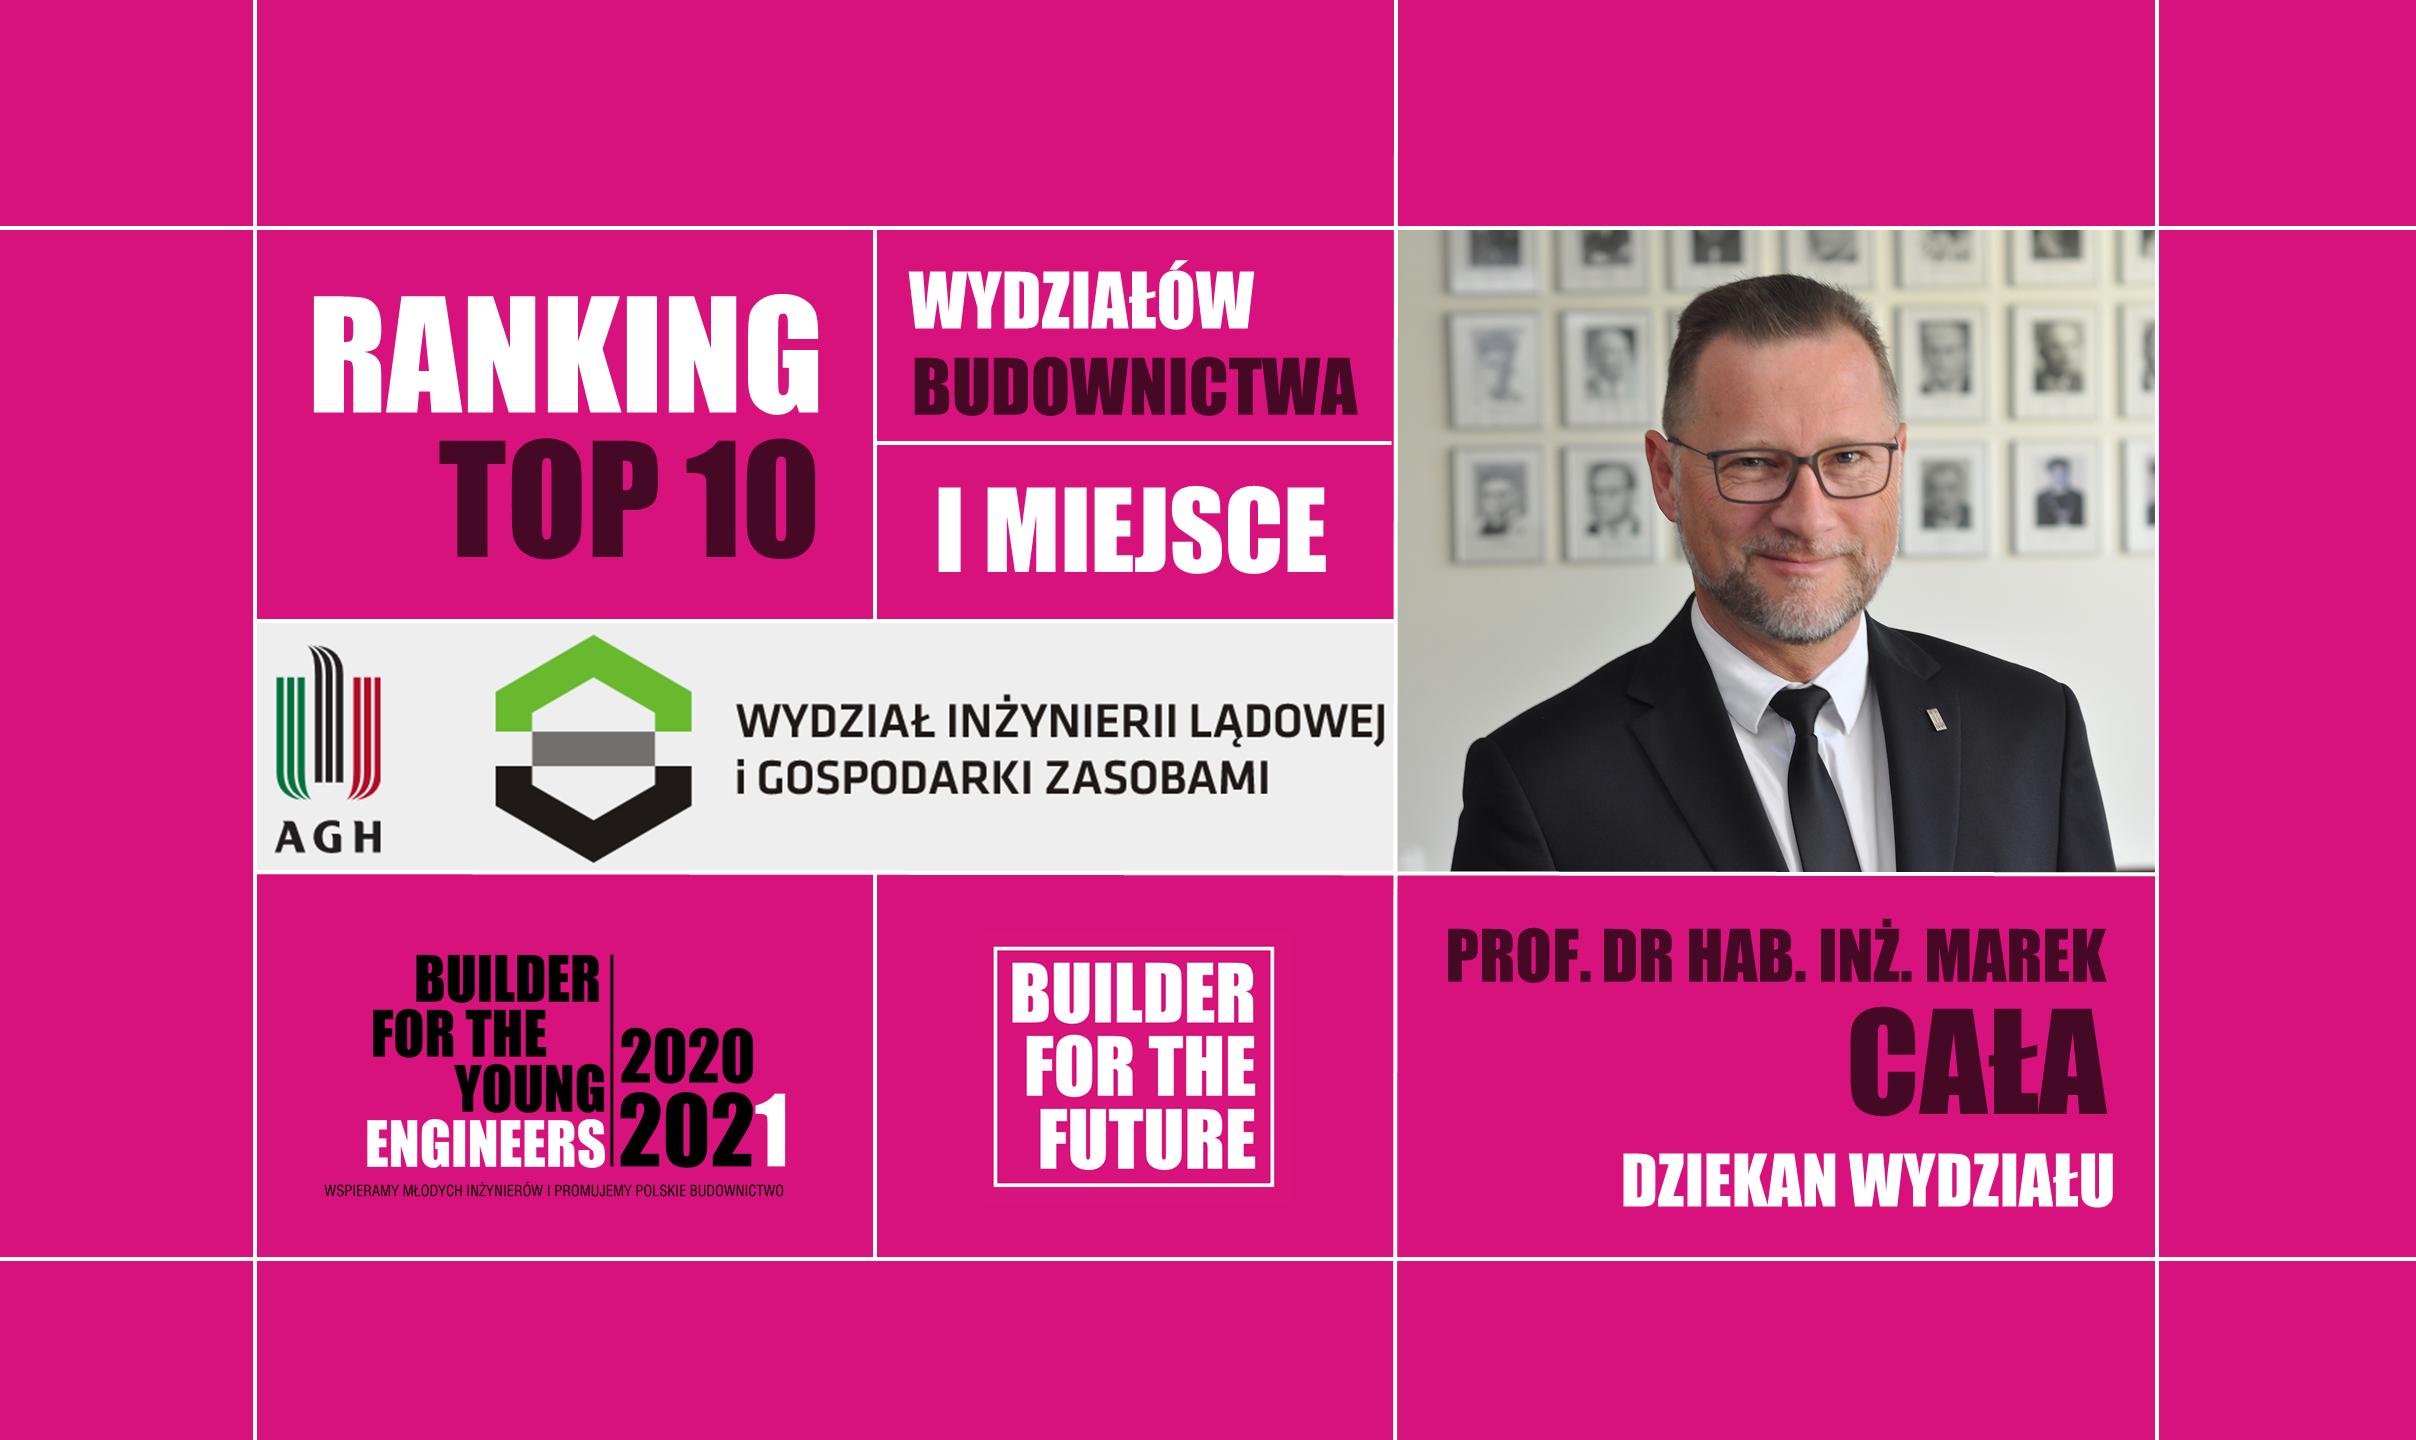 I MIEJSCE W RANKINGU TOP10 FOR THE FUTURE 2020/21